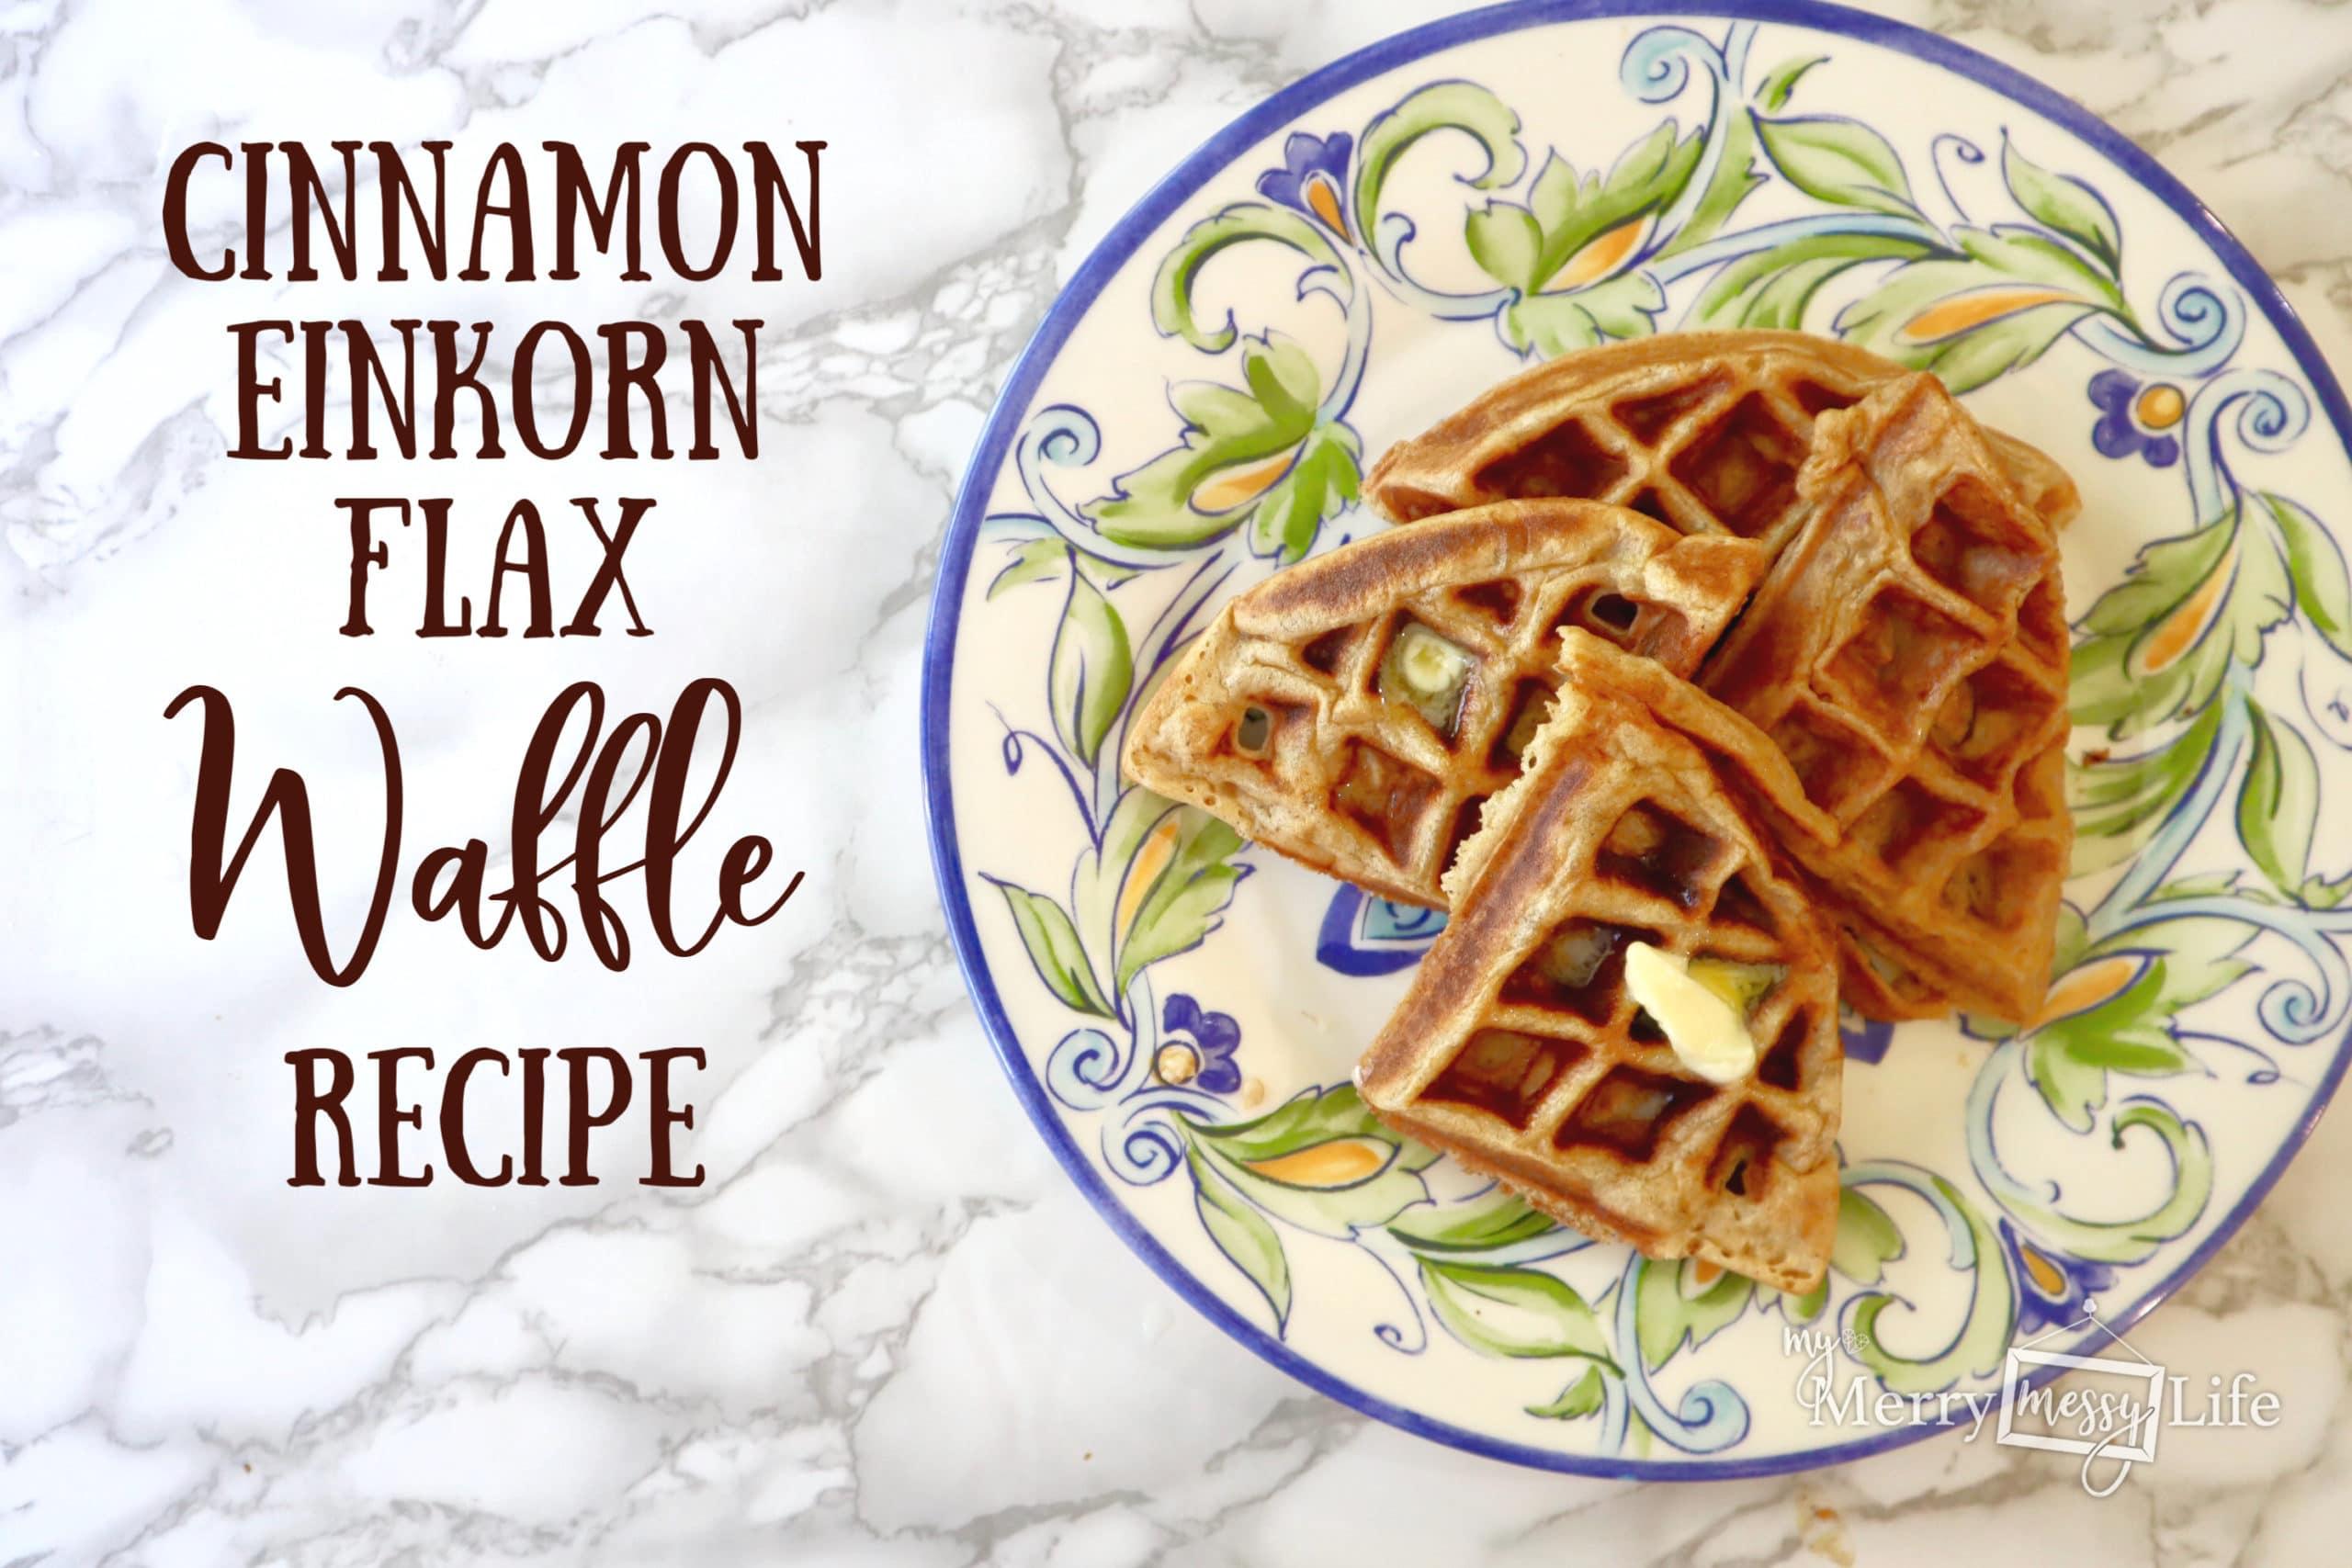 Cinnamon Einkorn Flax Waffle Recipe Picture